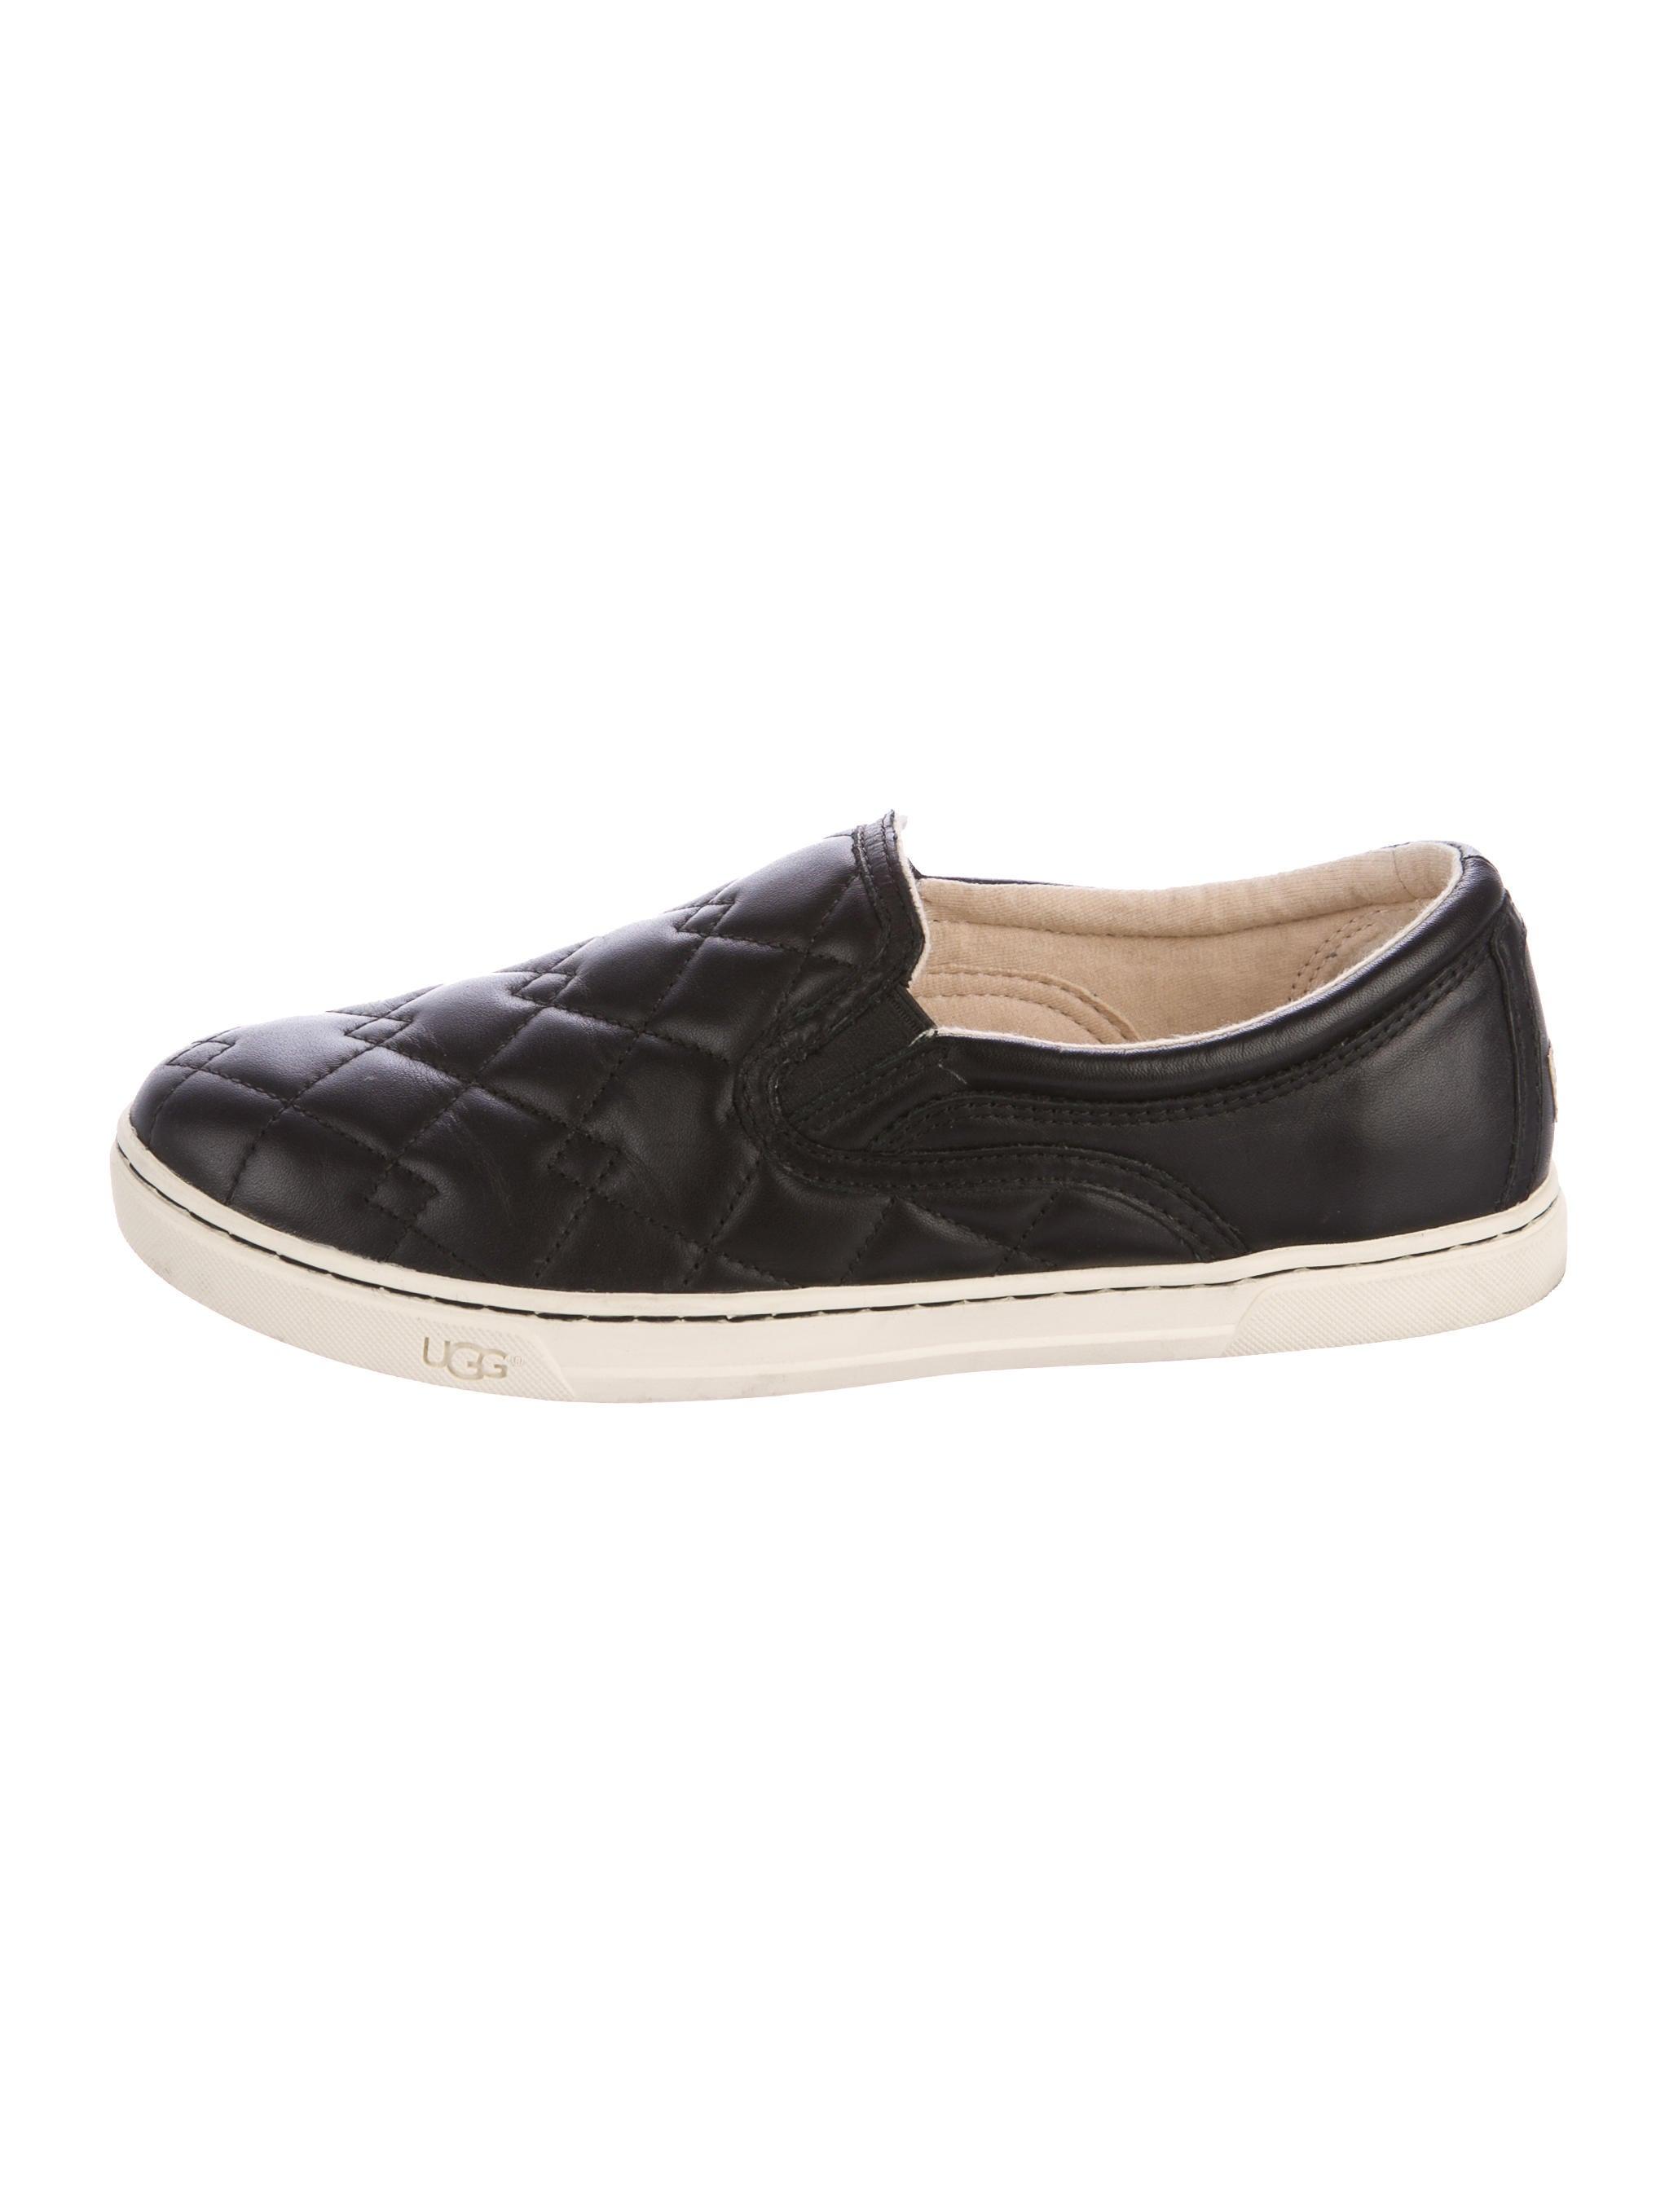 ugg slip ons shoes